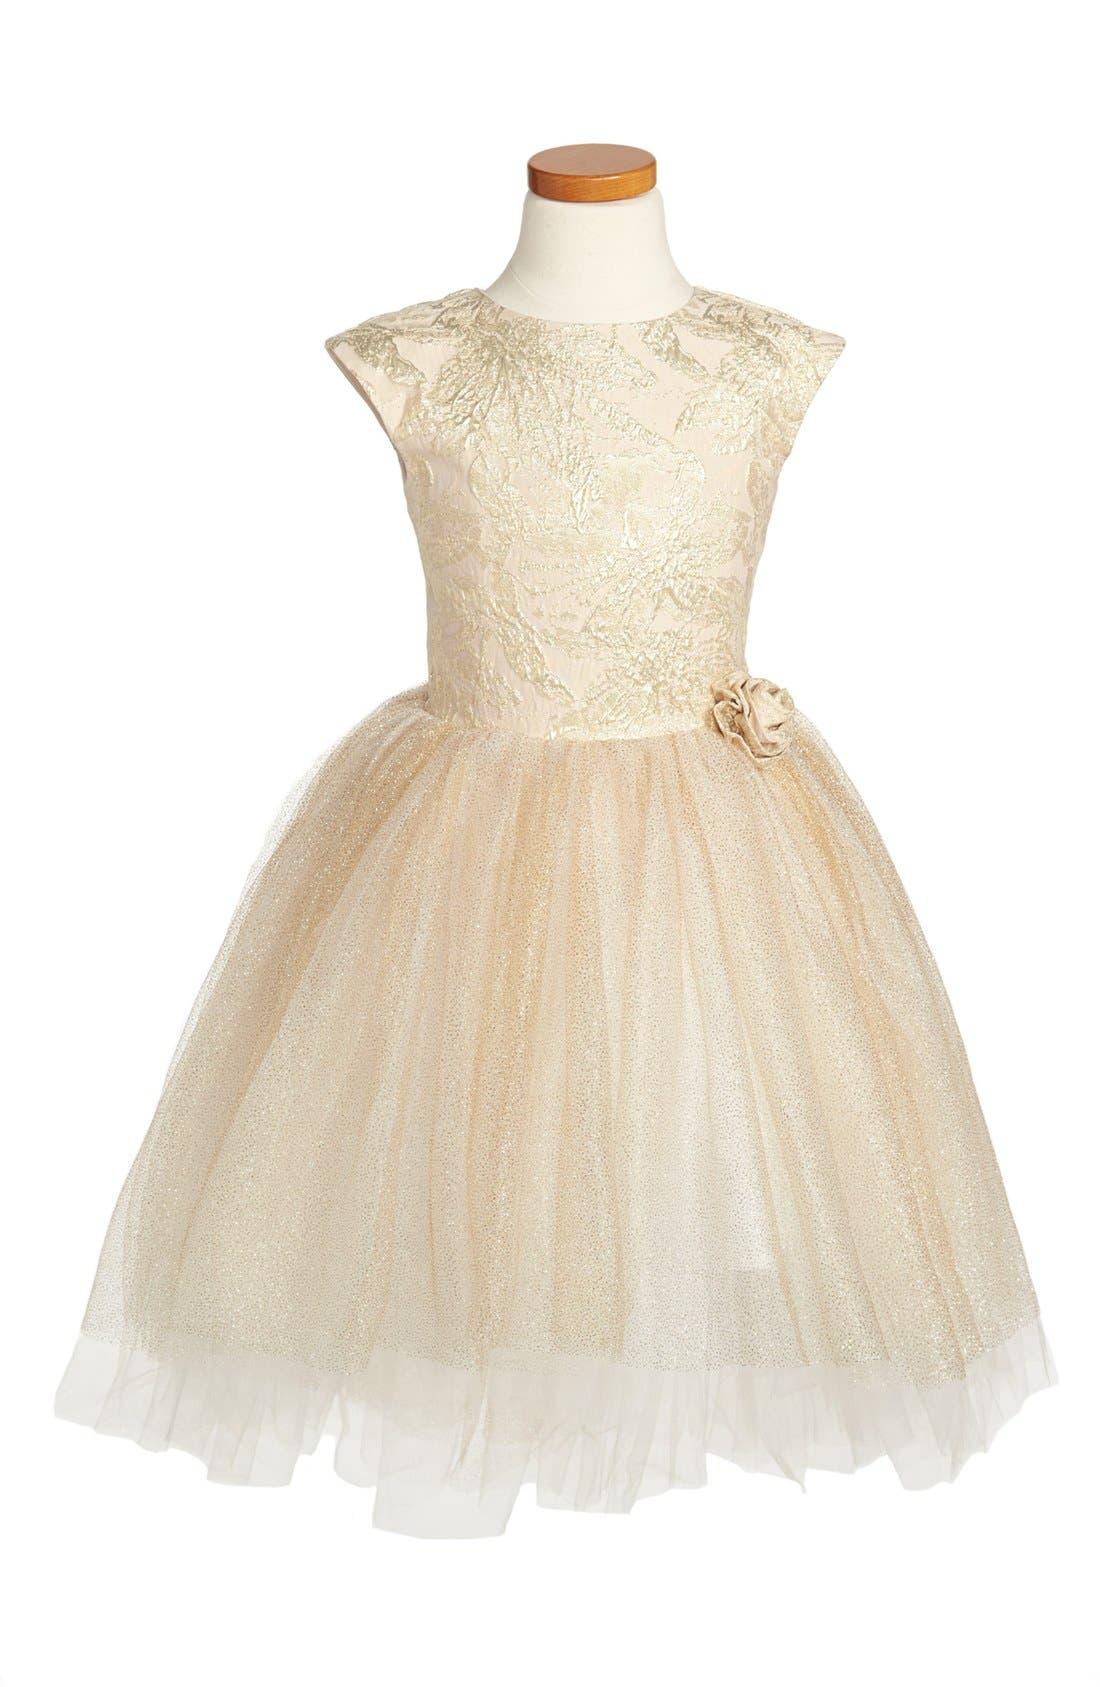 Alternate Image 1 Selected - Halabaloo 'Princess' Dress (Little Girls & Big Girls)